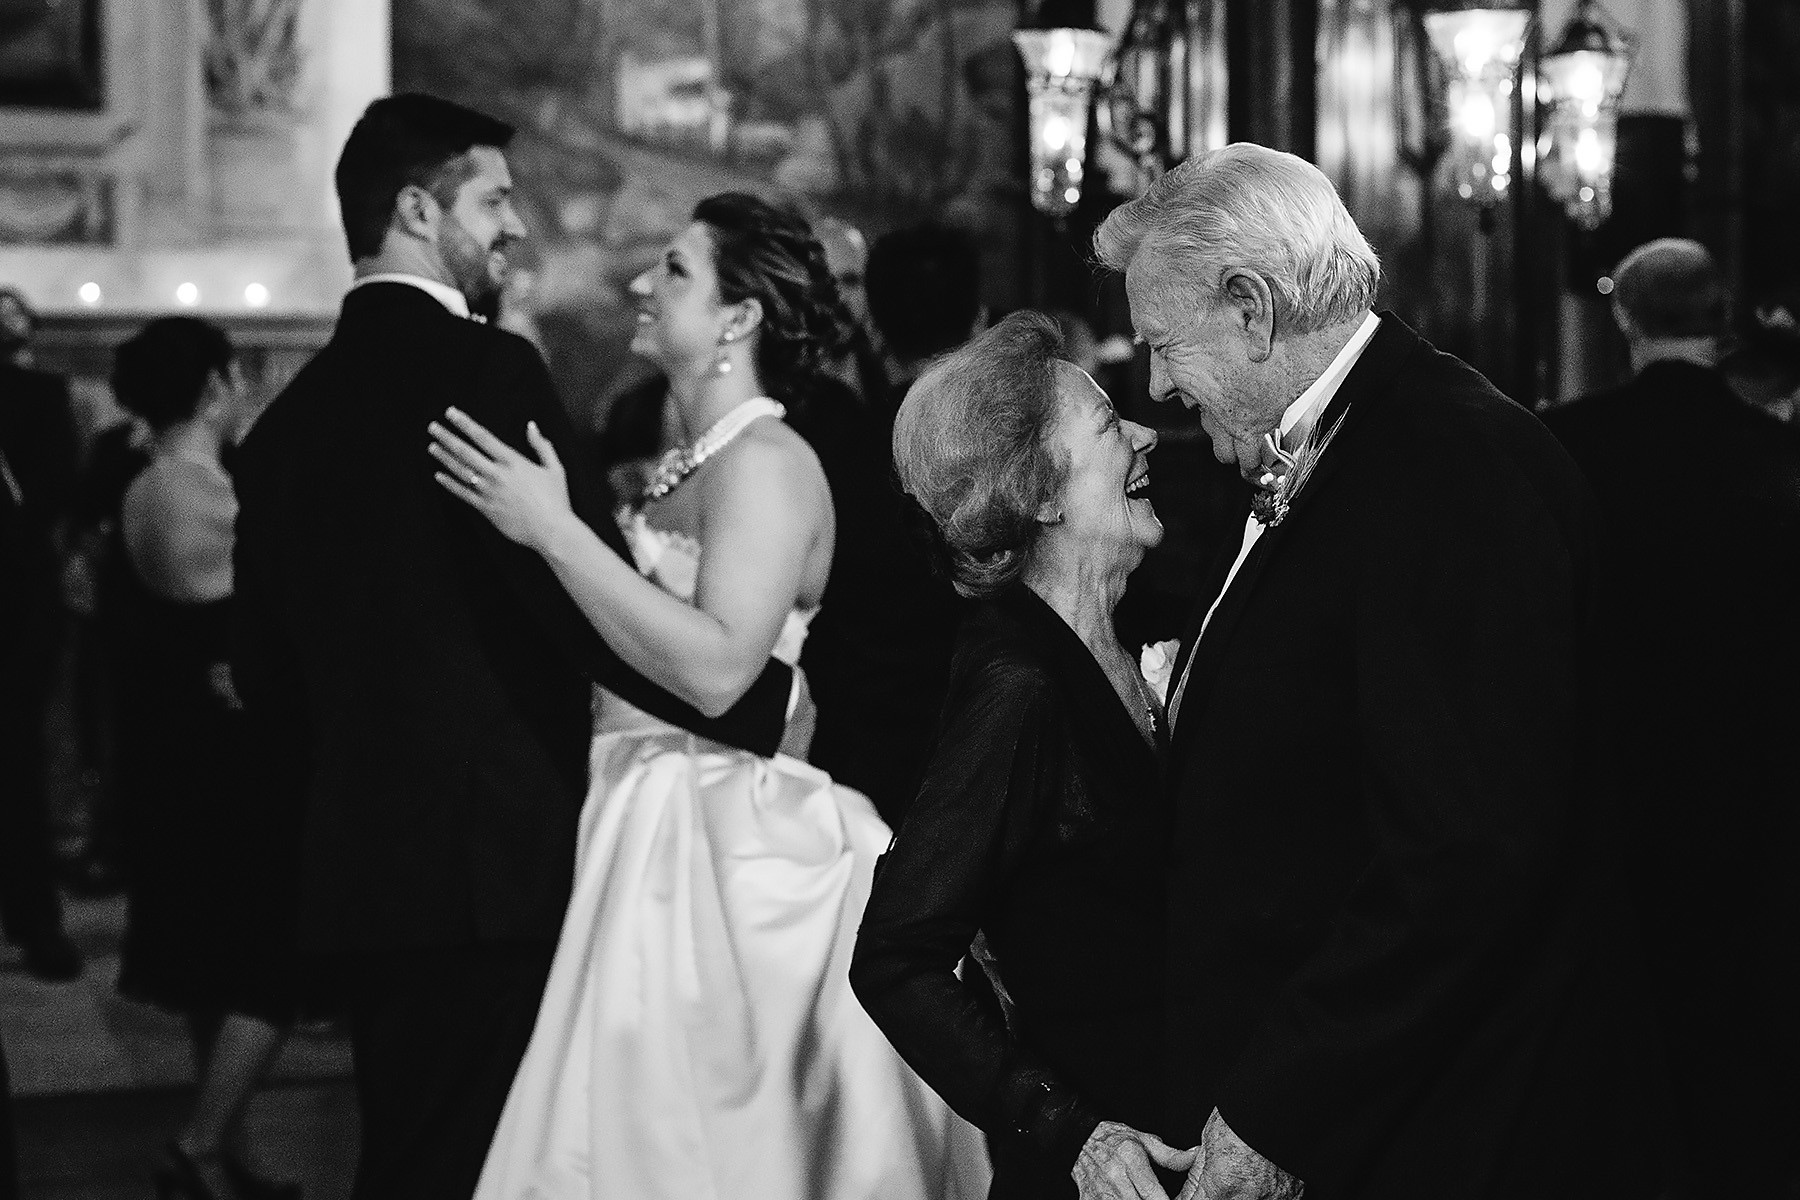 Grandmother & Grandfather of Bride & Groom Dance